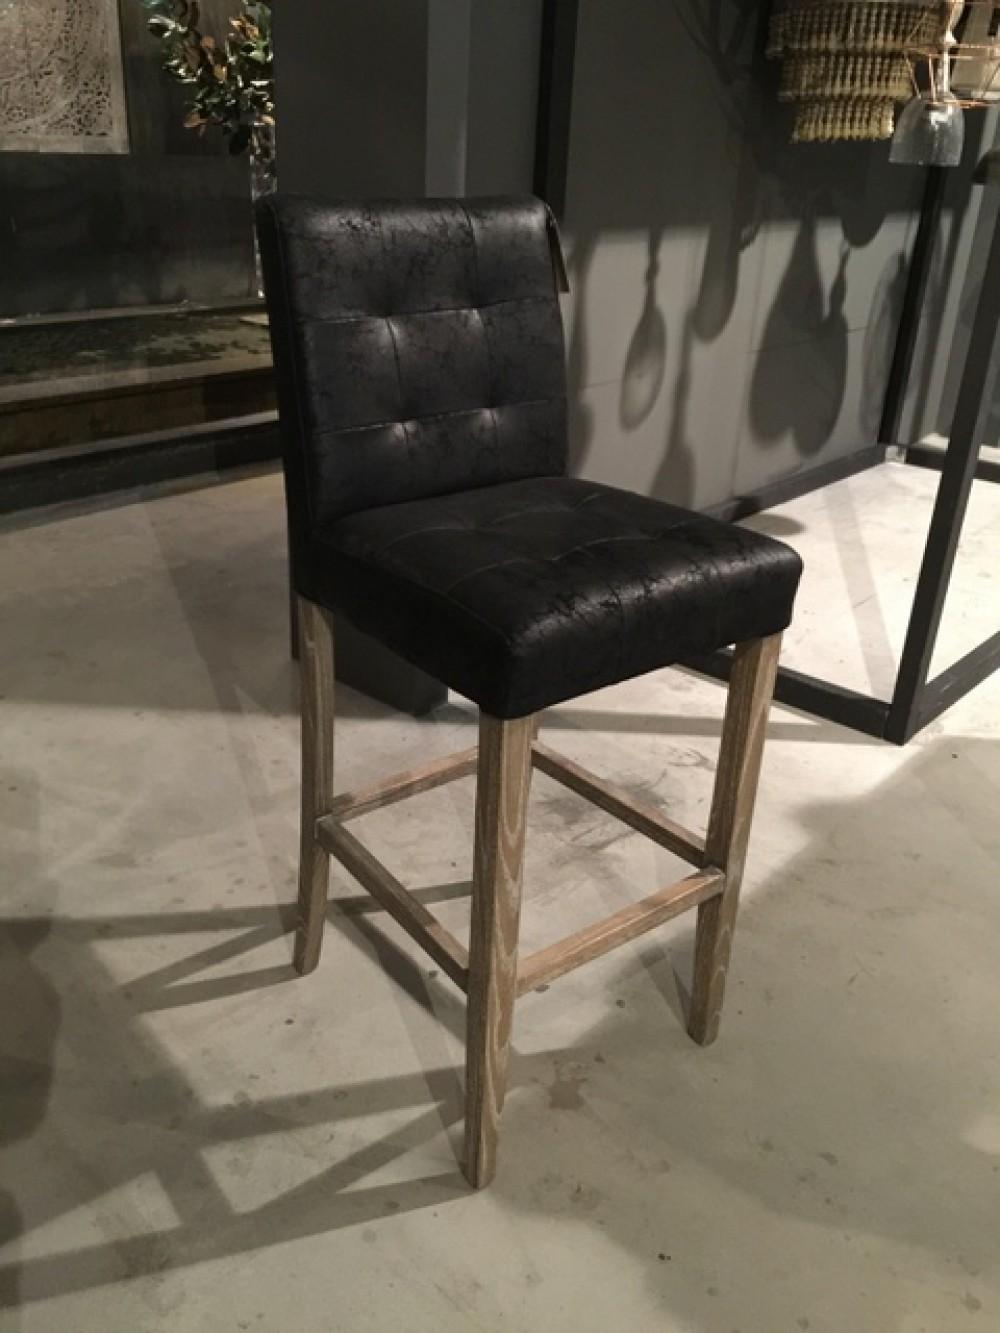 barstuhl schwarz gepolstert barhocker schwarz tresenhocker landhaus stil m bel. Black Bedroom Furniture Sets. Home Design Ideas